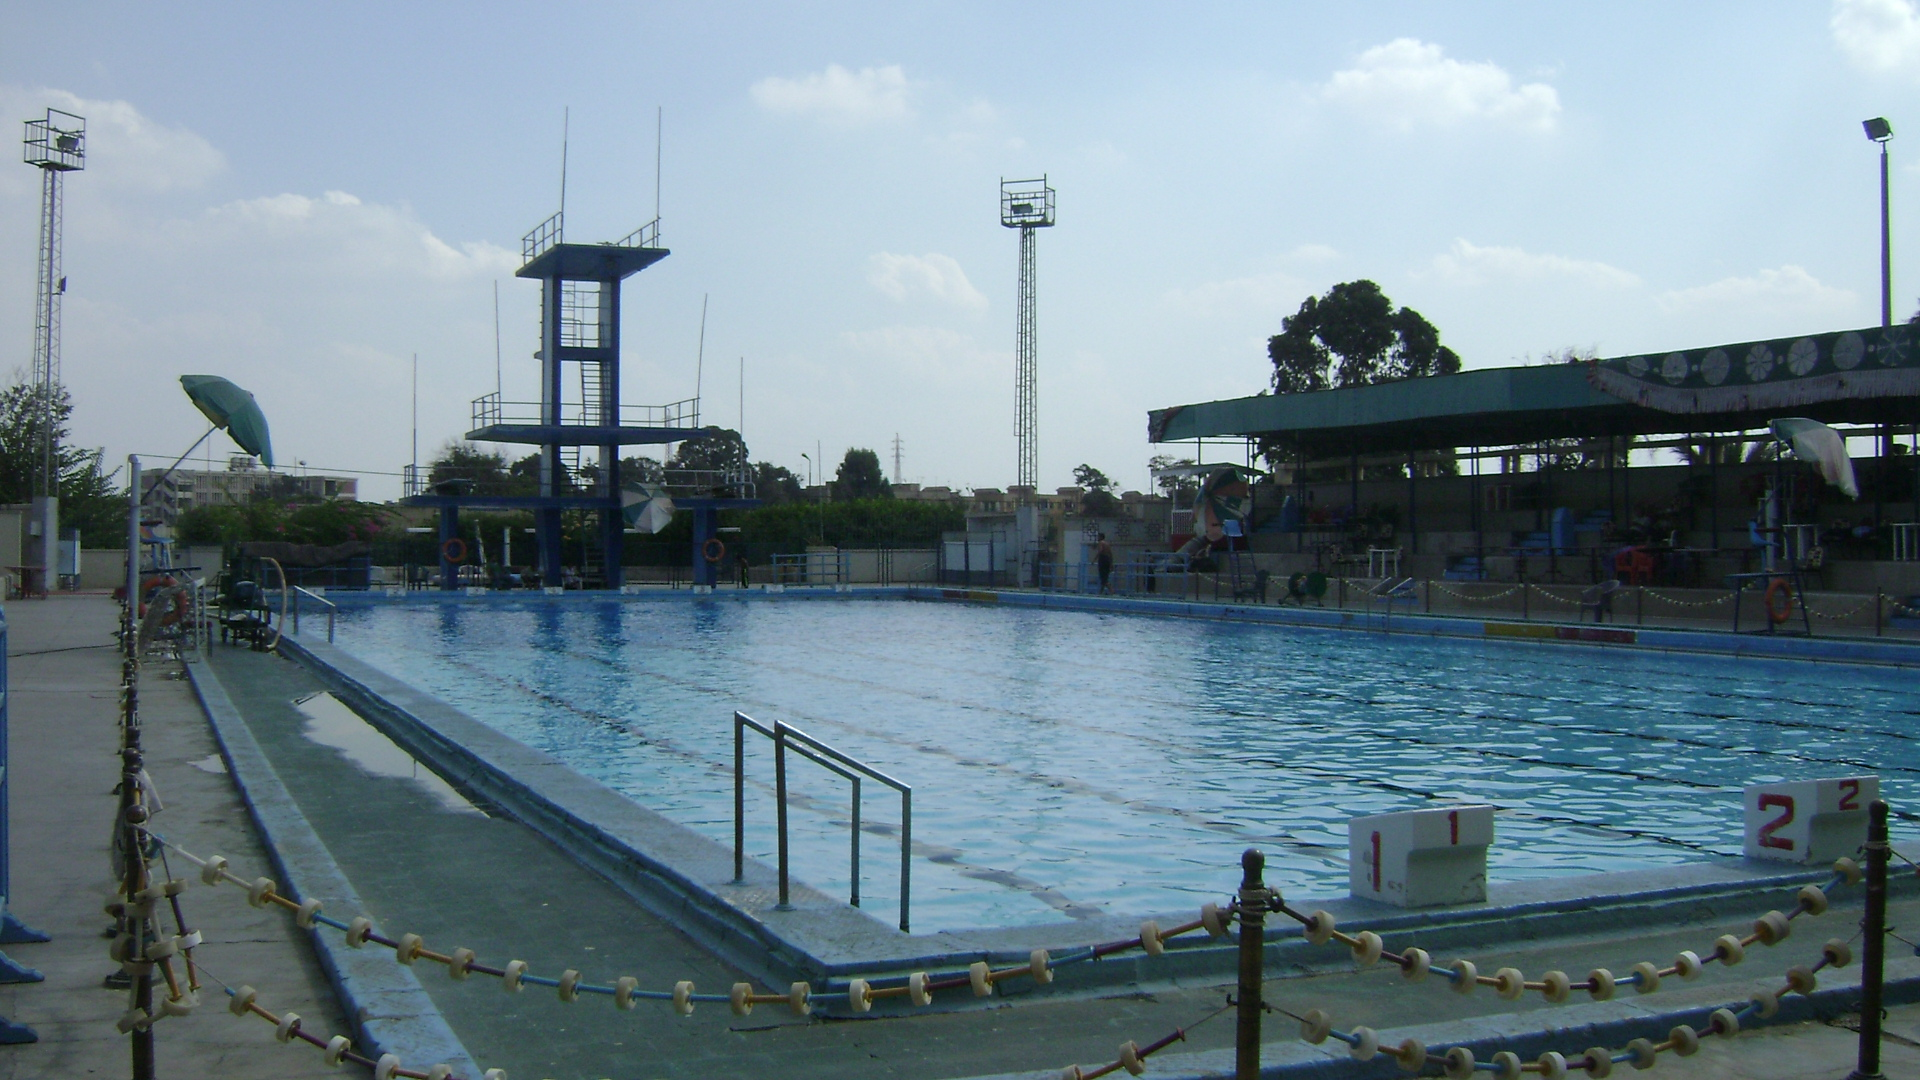 حمامات سباحة في مصر from photos.wikimapia.org